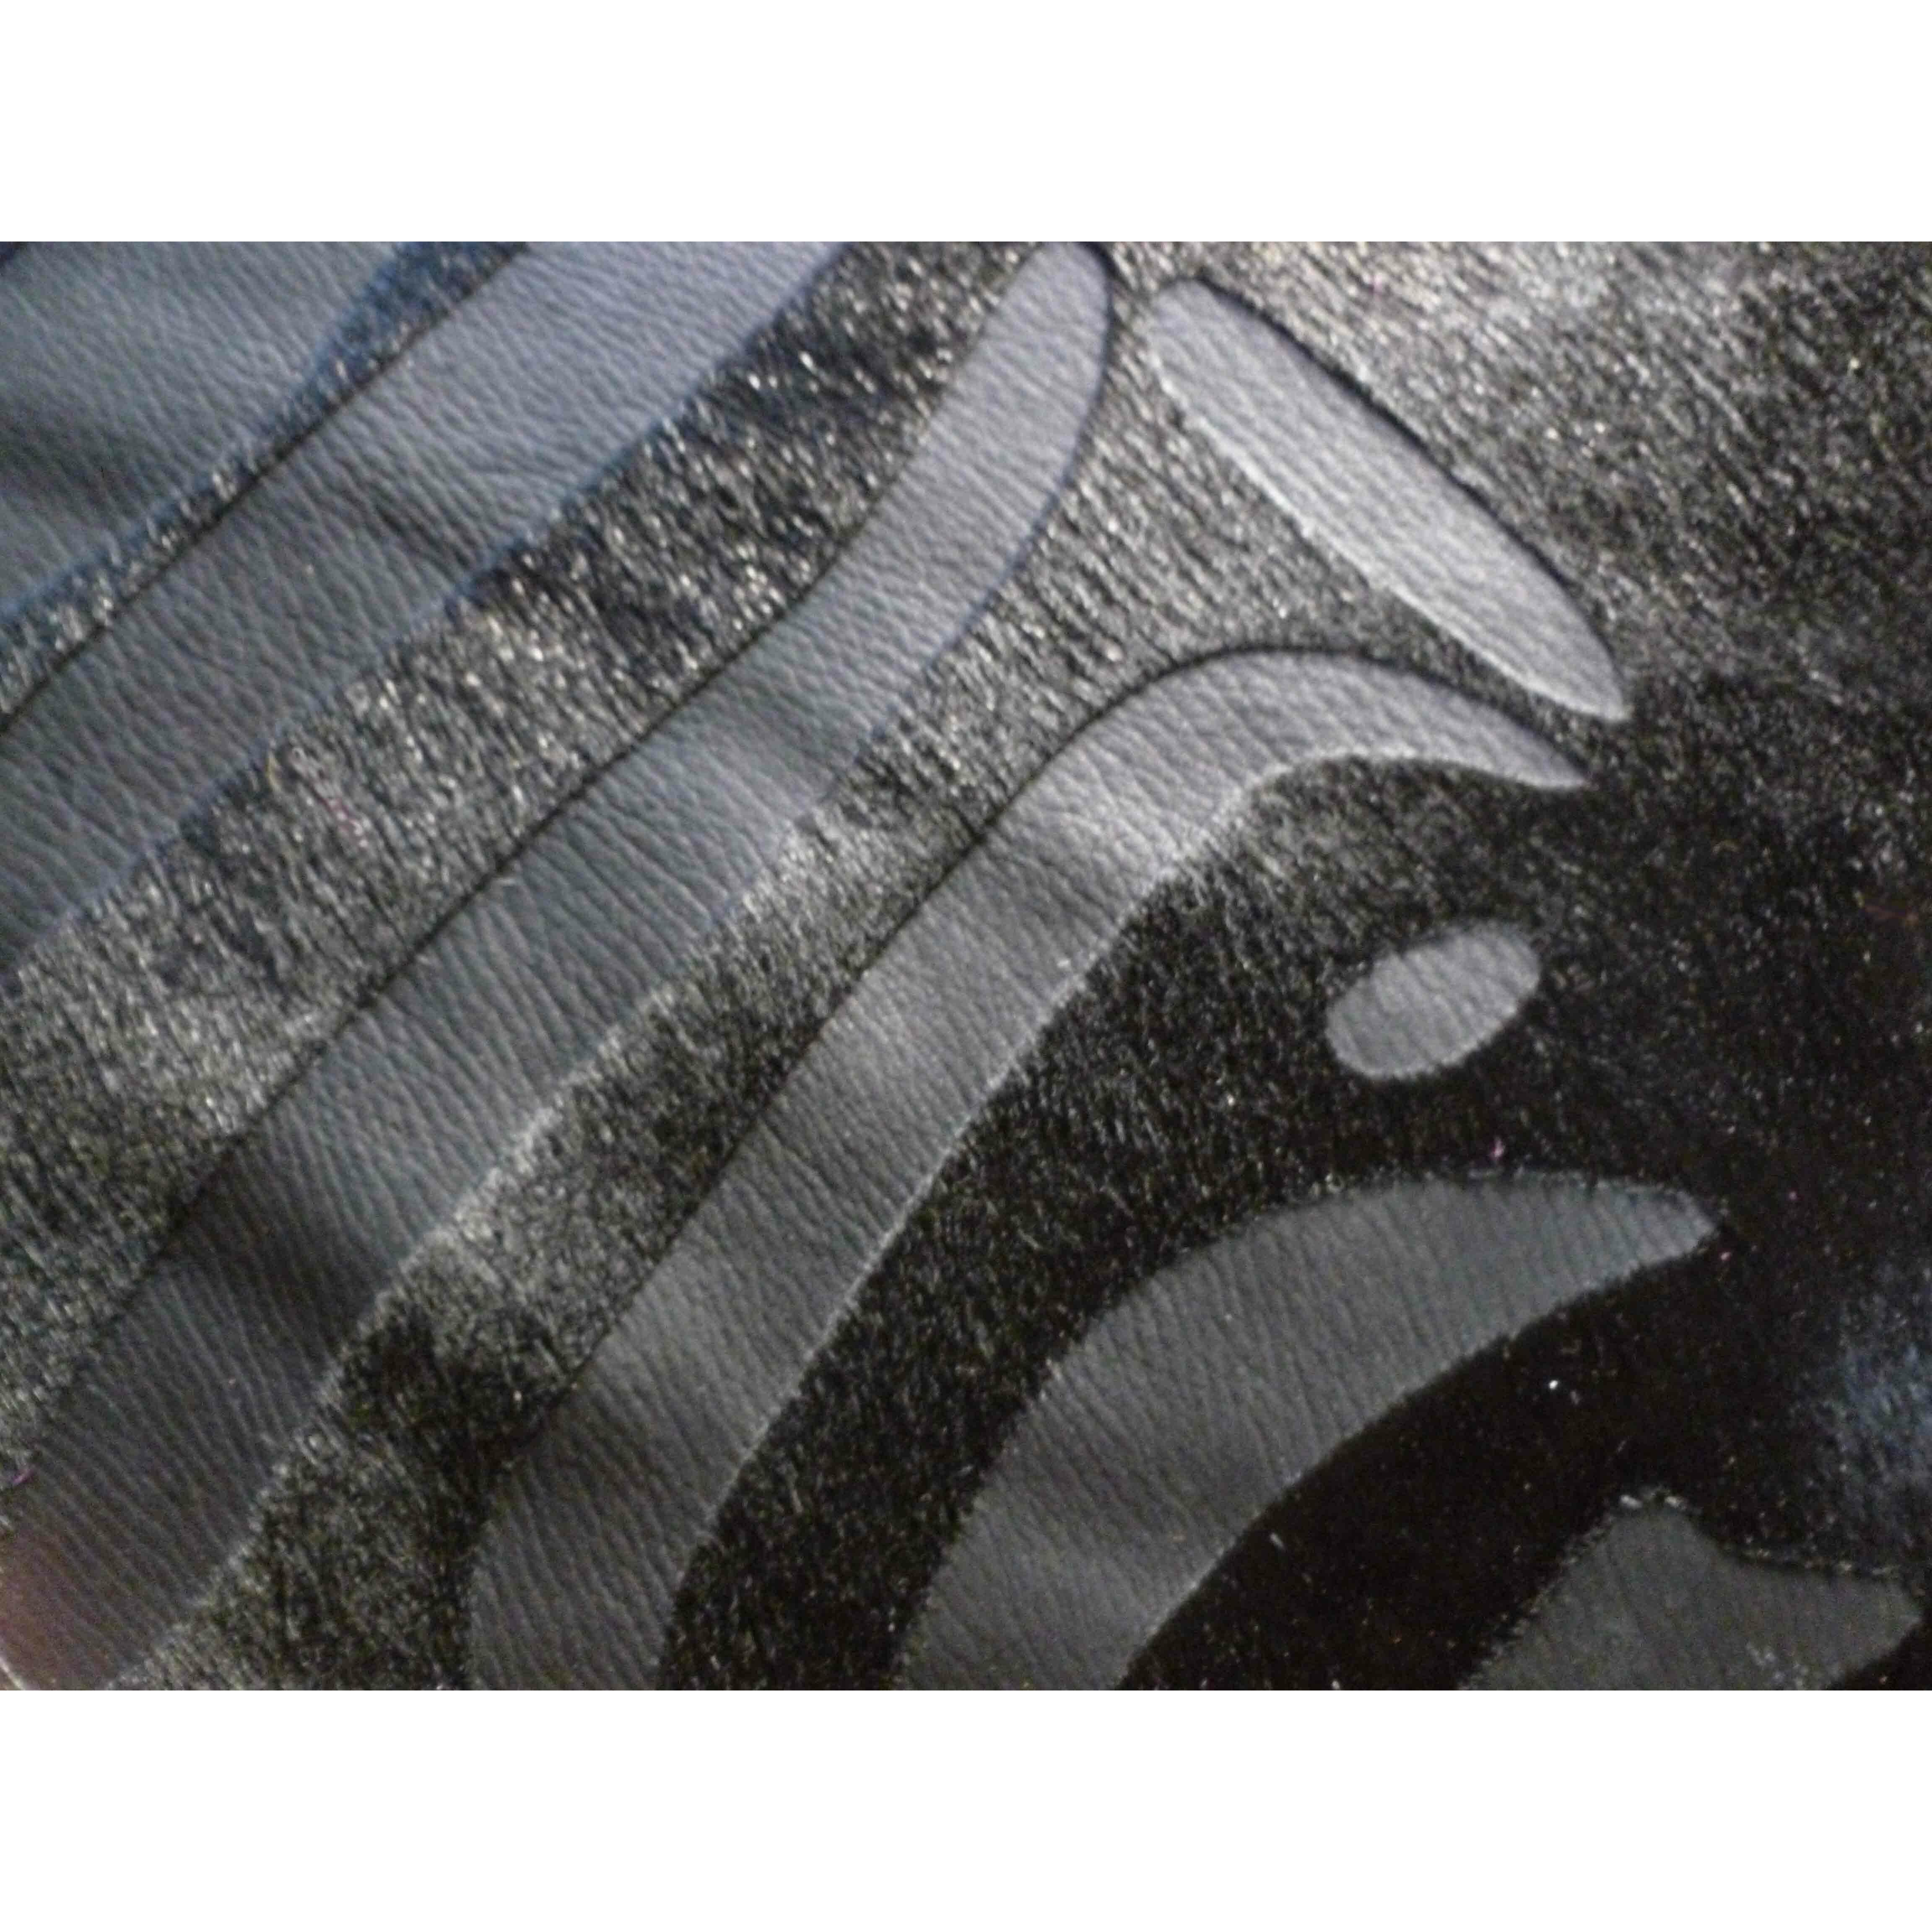 Zebra Rug Wayfair: Chesterfield Leather Etched Zebra Brazilian Cowhide Black